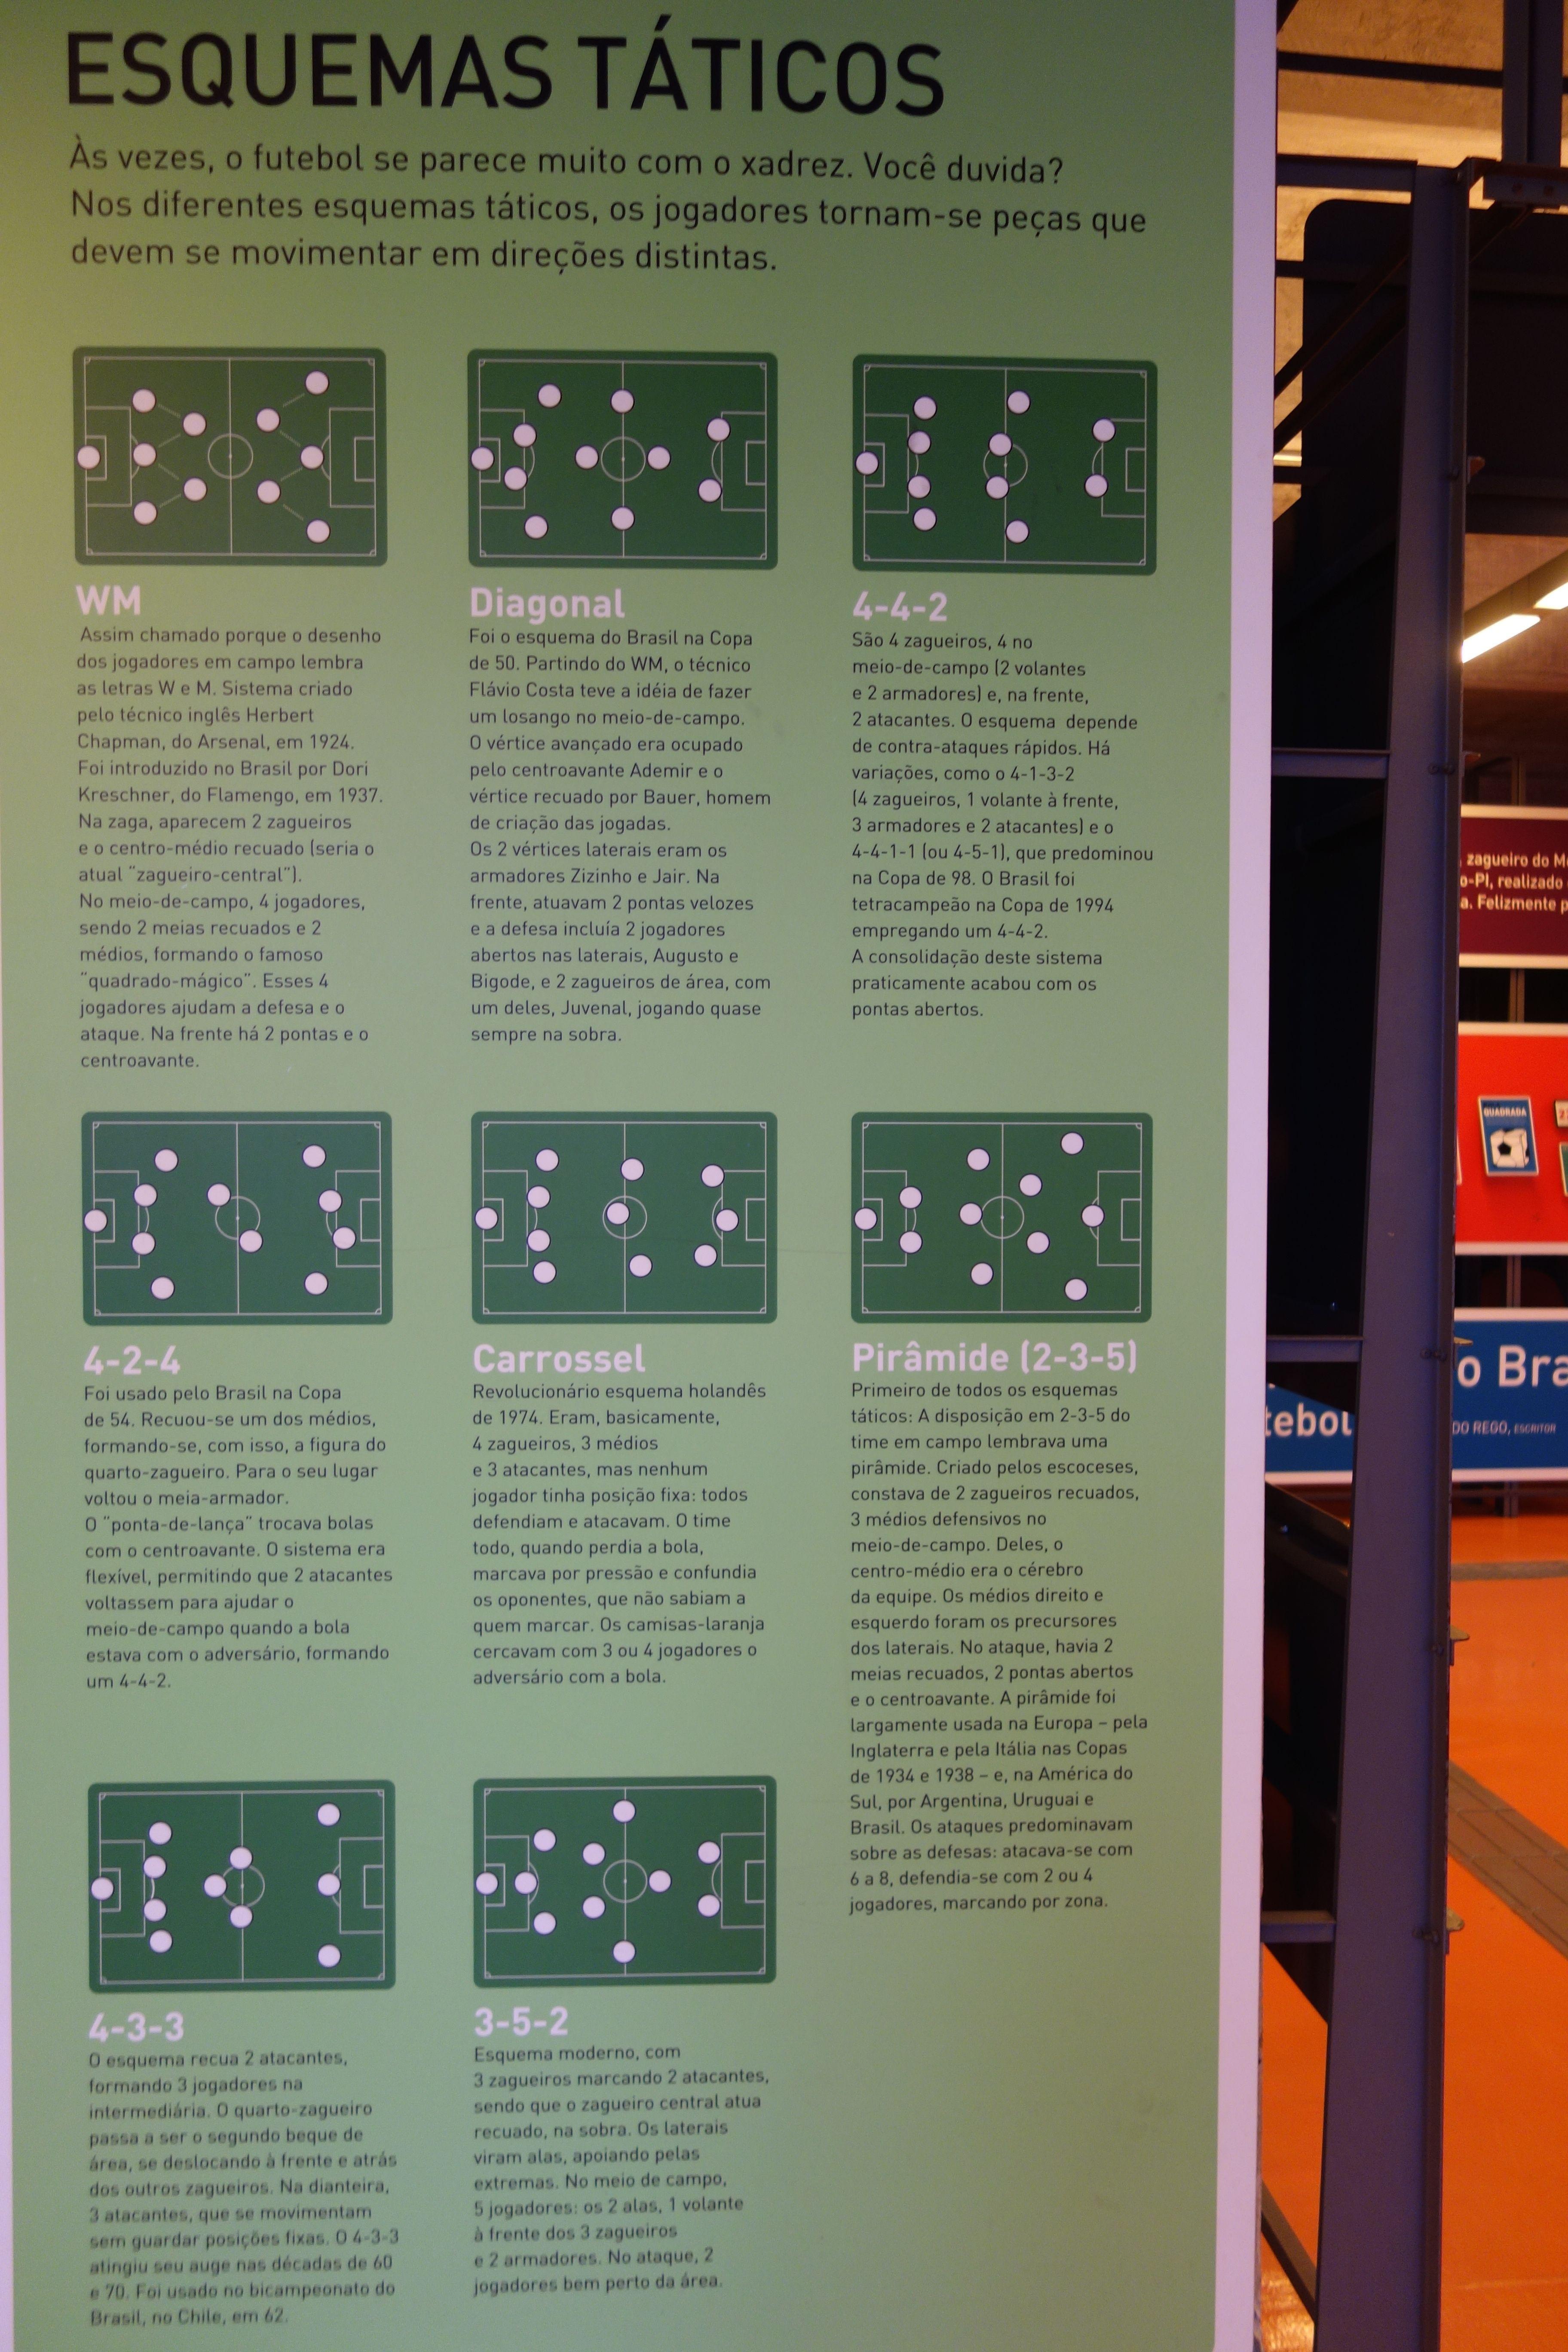 COUPE DU MONDE DE FOOTBALL: Musee du football a Sao Paulo, les differentes strategies.